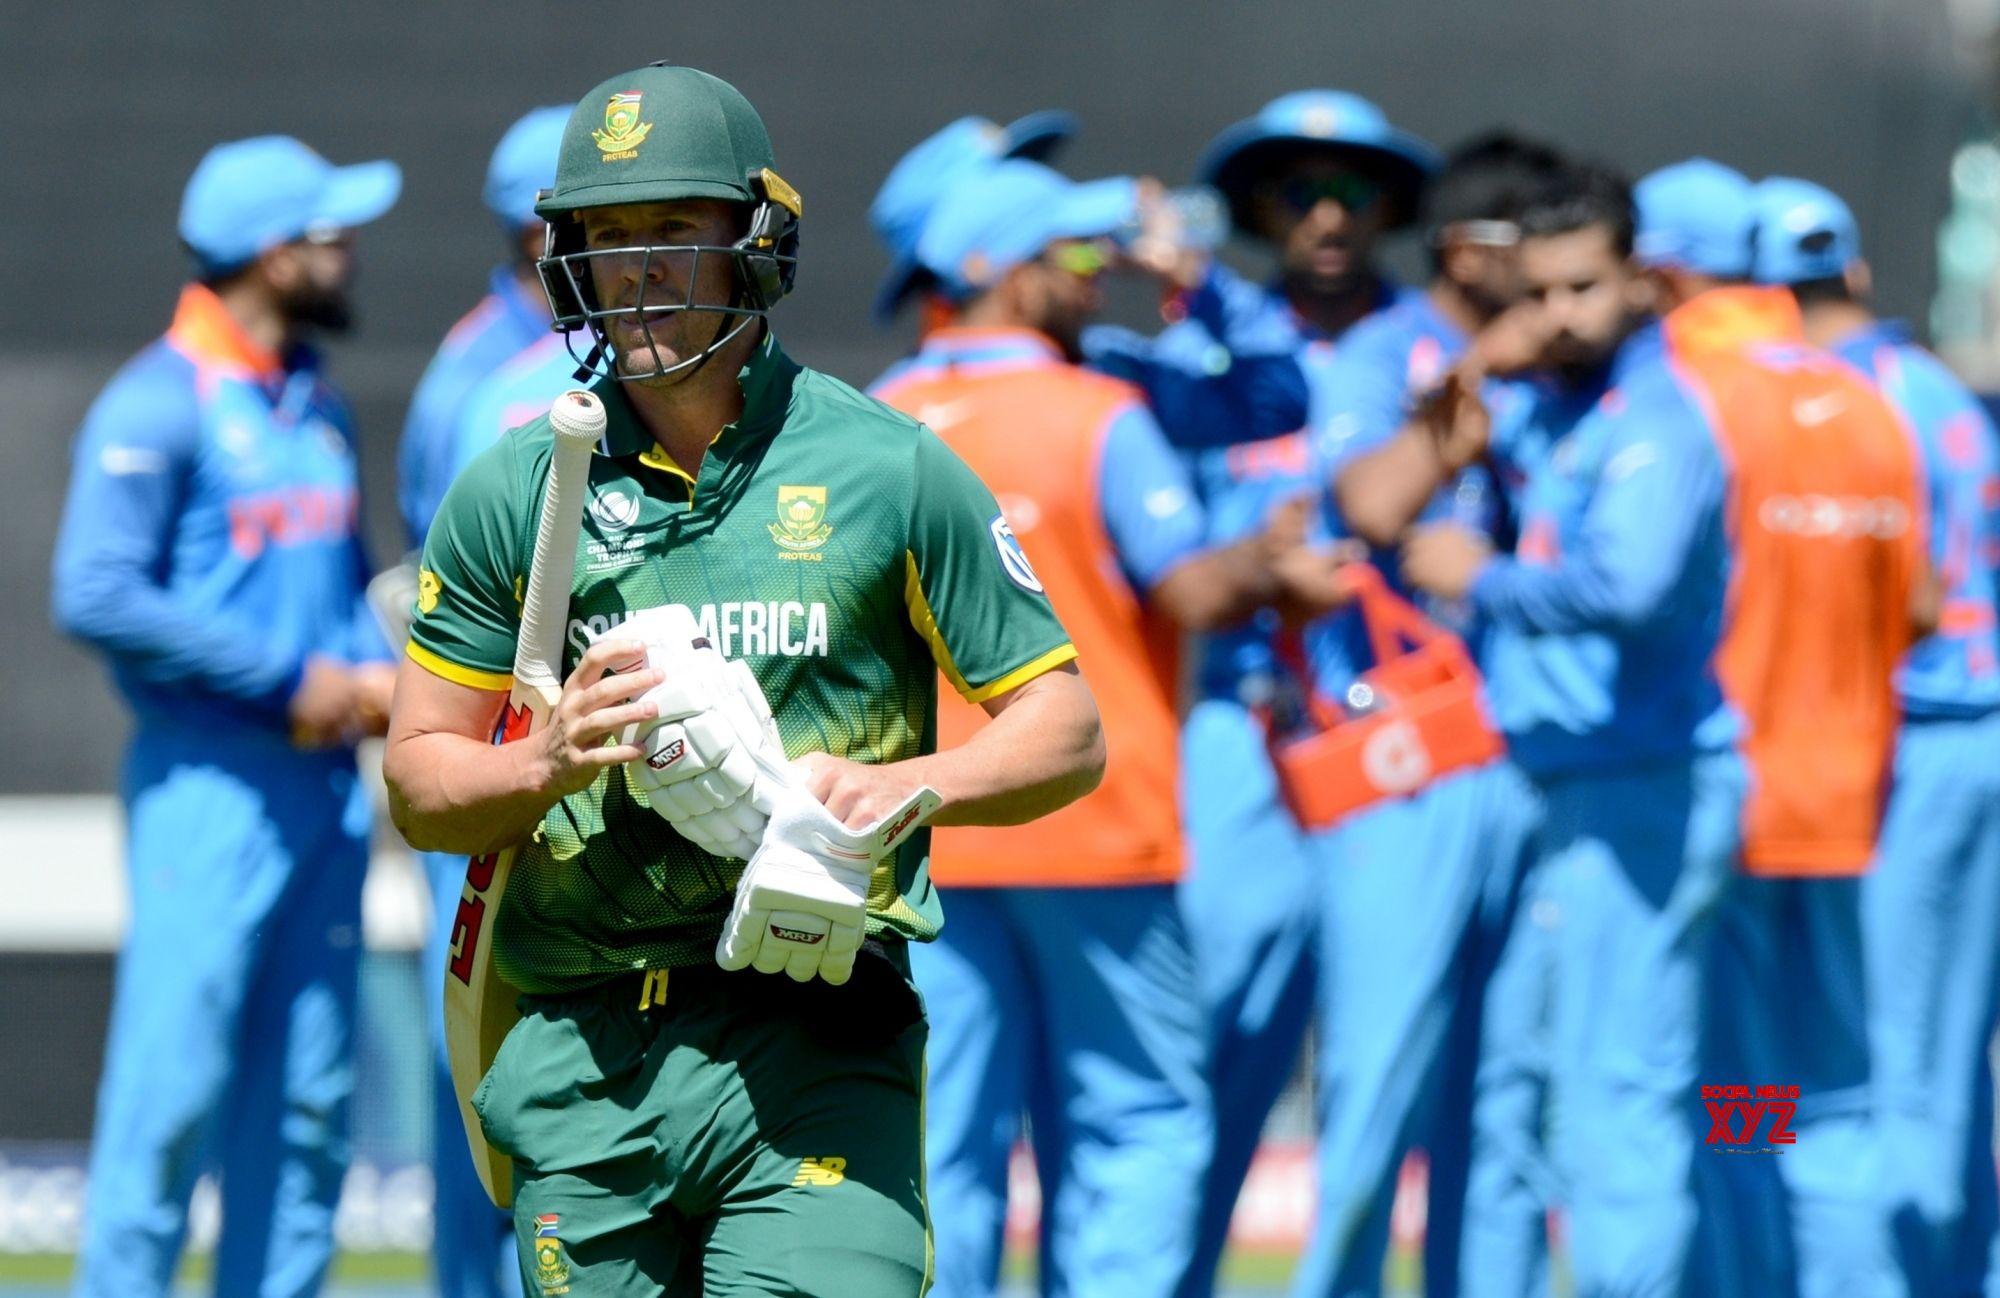 Soft dismissals cost us the match, says de Villiers - Social News XYZ